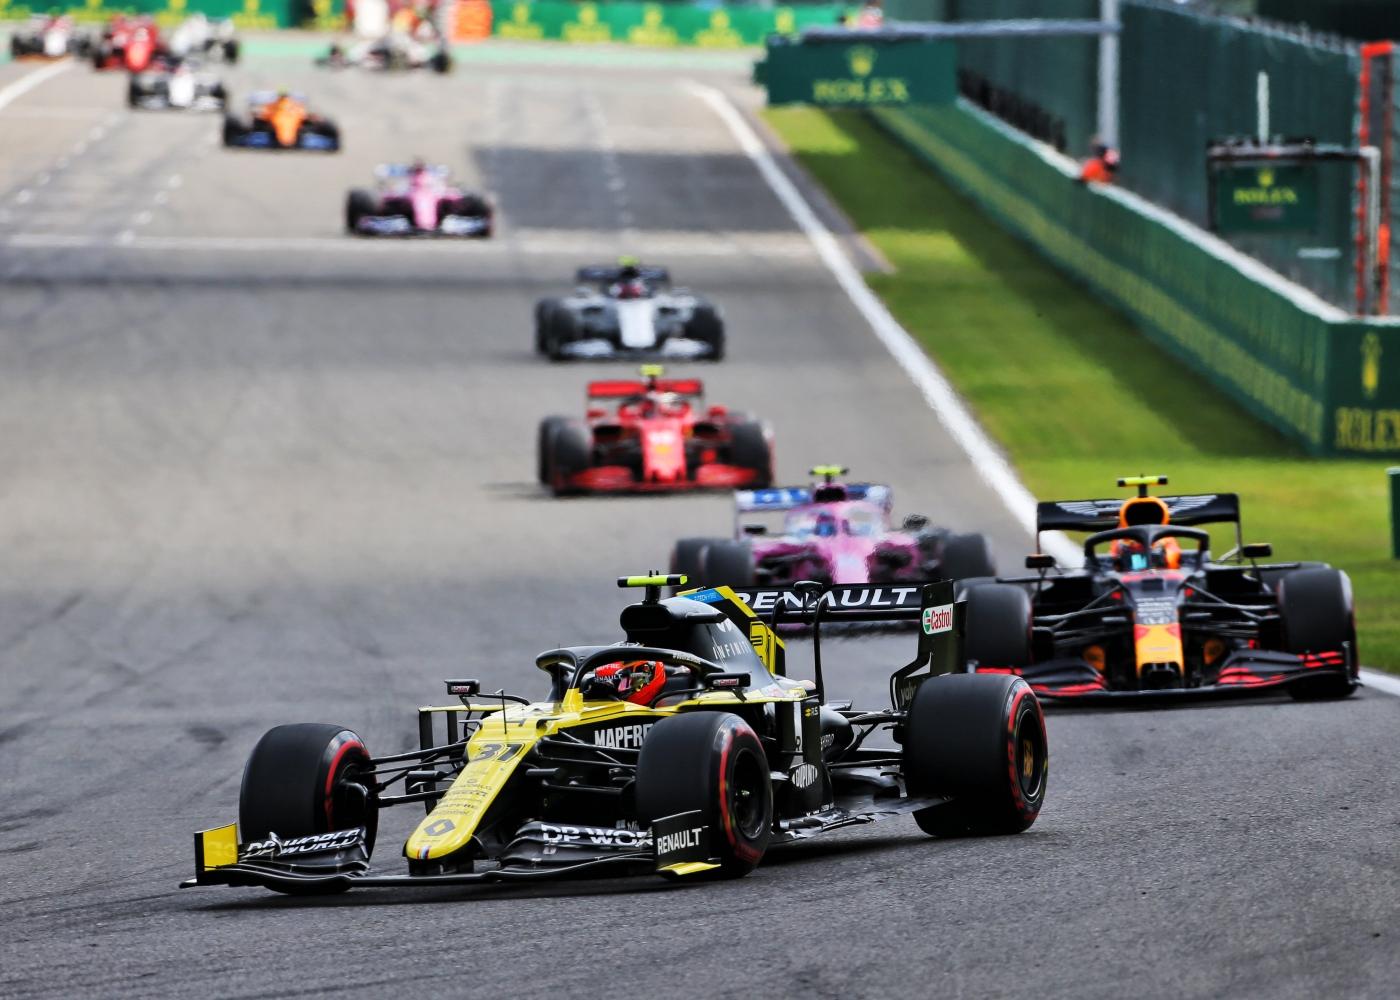 Renault Formula 1